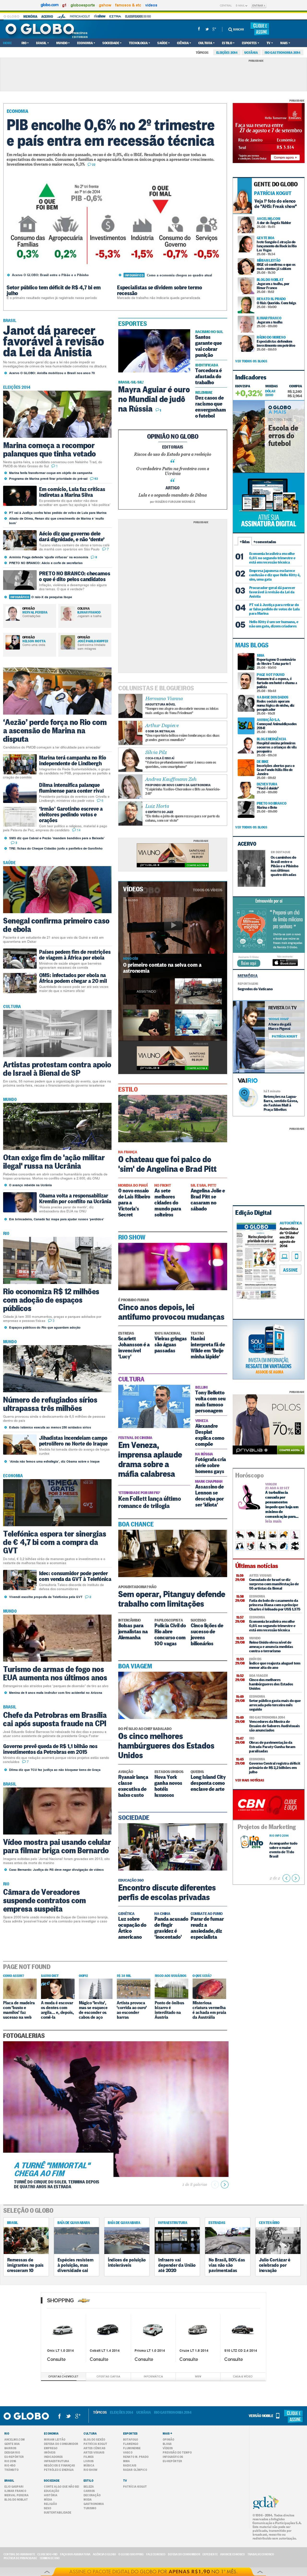 O Globo at Friday Aug. 29, 2014, 3:05 p.m. UTC